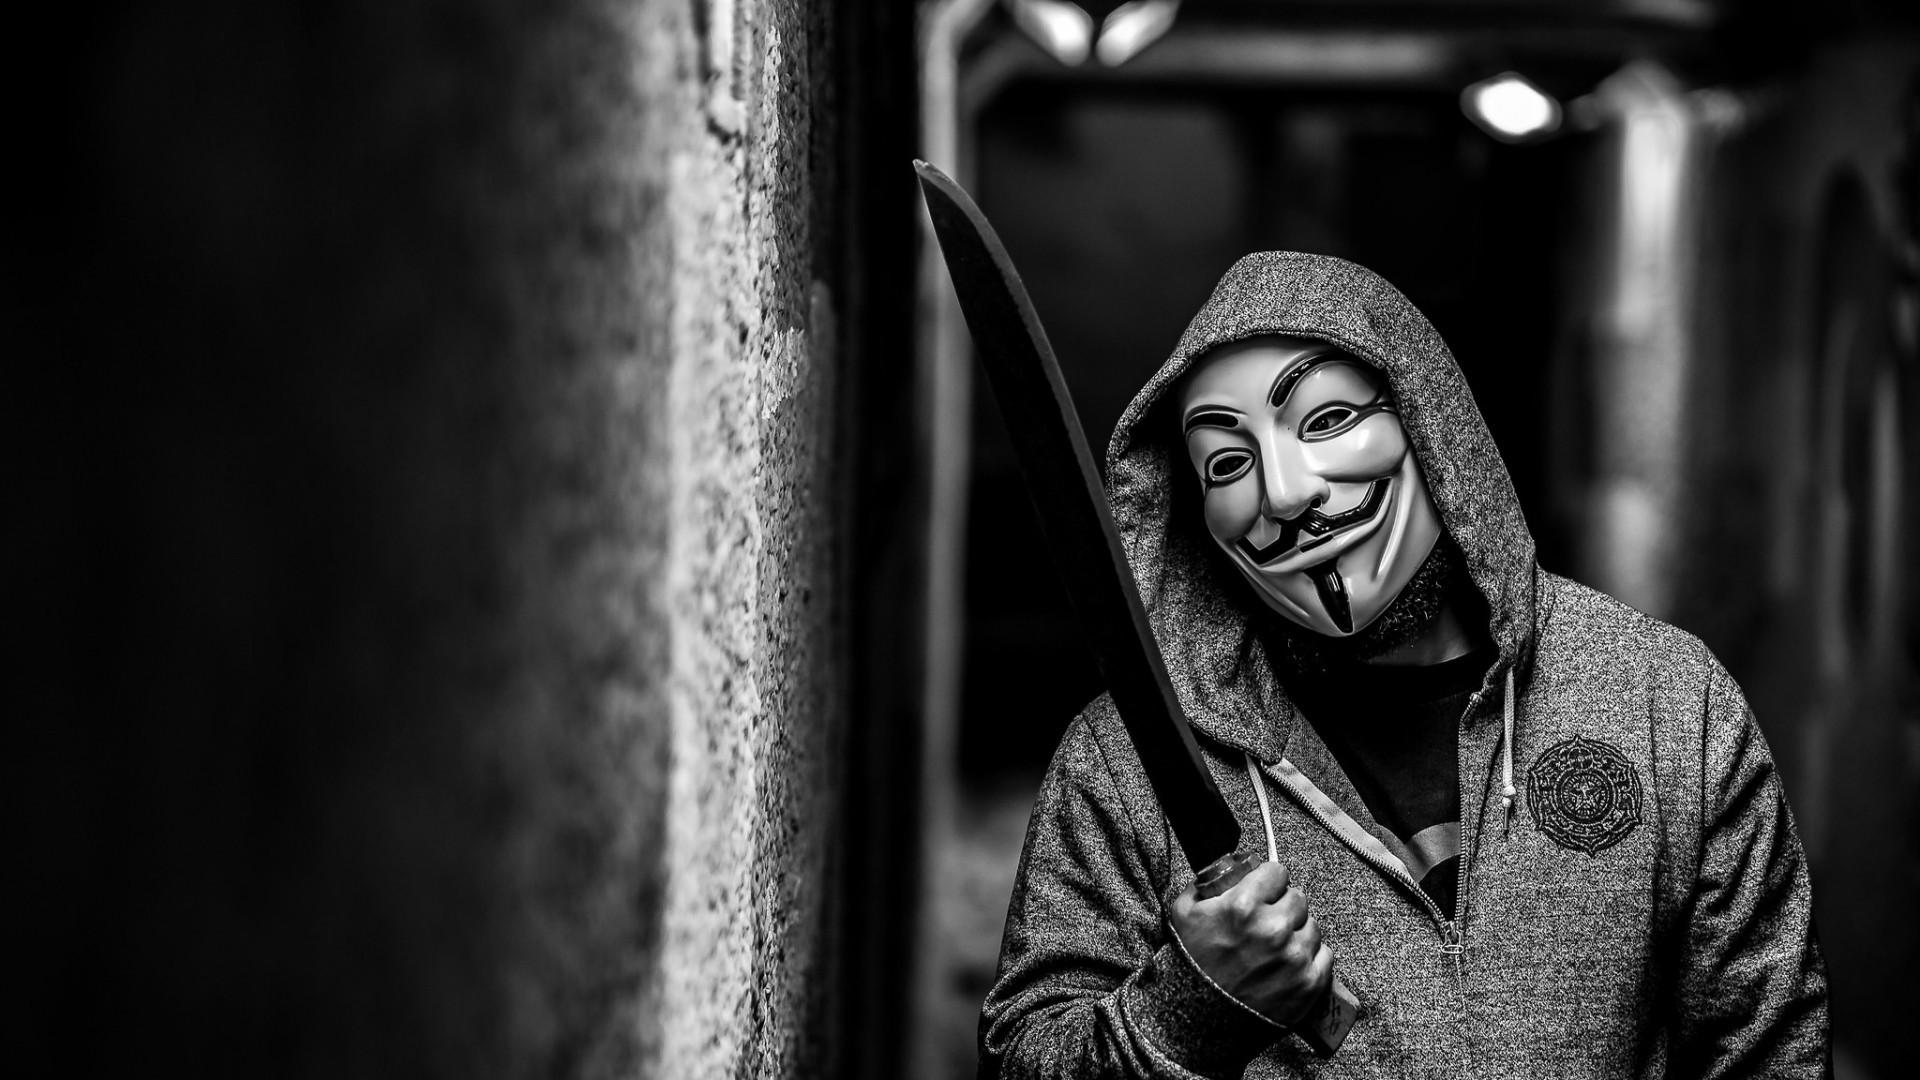 Wallpaper anonymous, guy fawkes mask, mask, machete